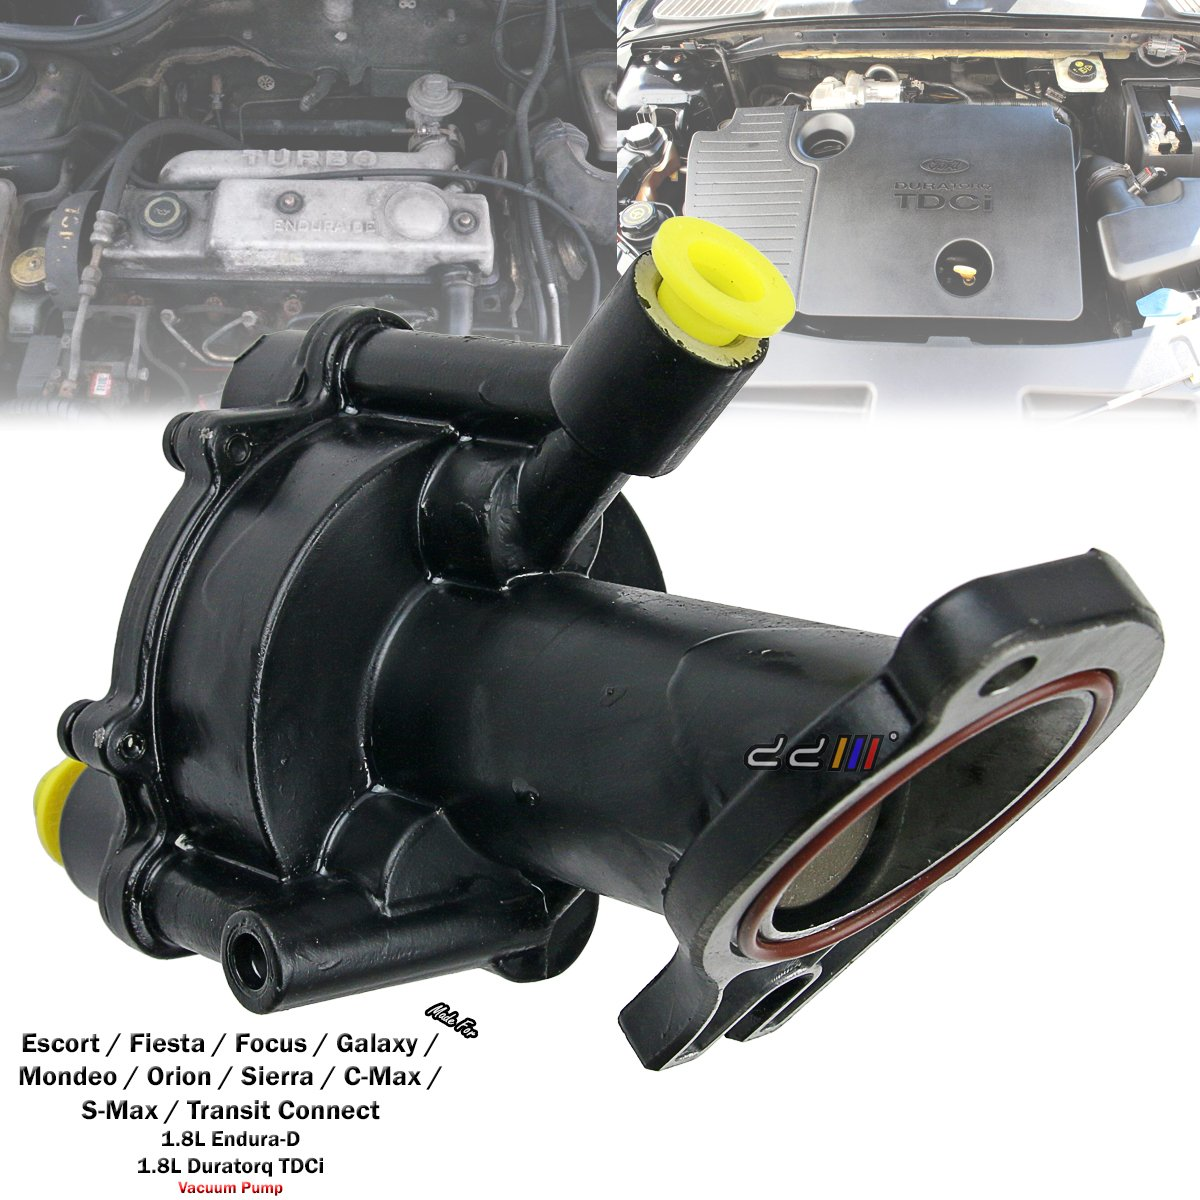 Engine Vacuum Pump For Escort Fiesta Focus Mondeo 1.8 TDDI TDCI Diesel 1119420